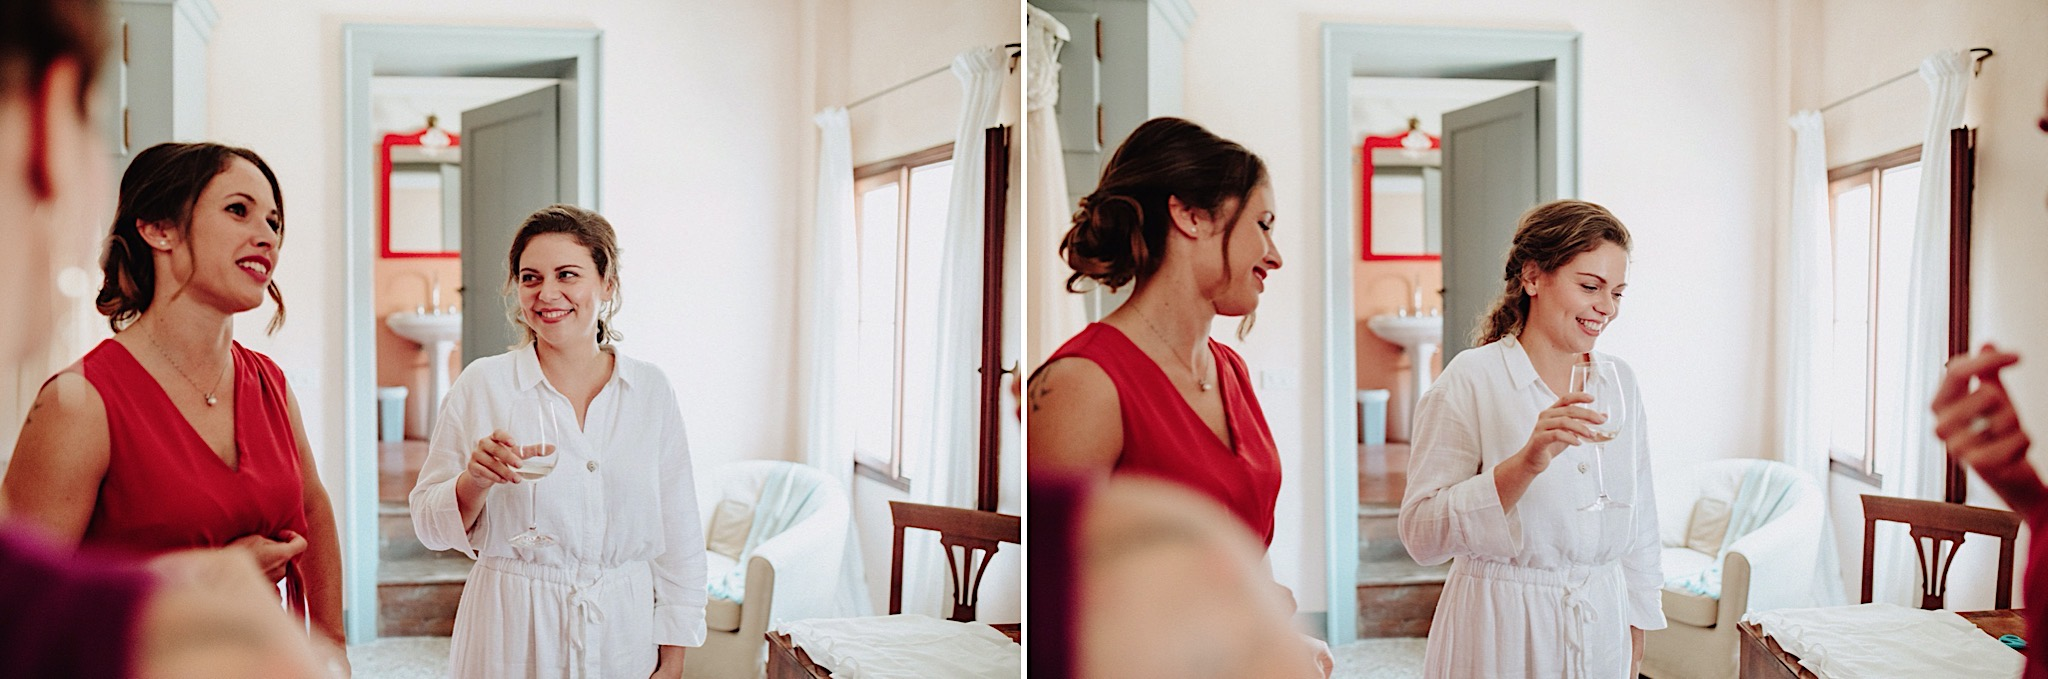 fotografo-matrimonio-villa-papafava-frassanelle-15